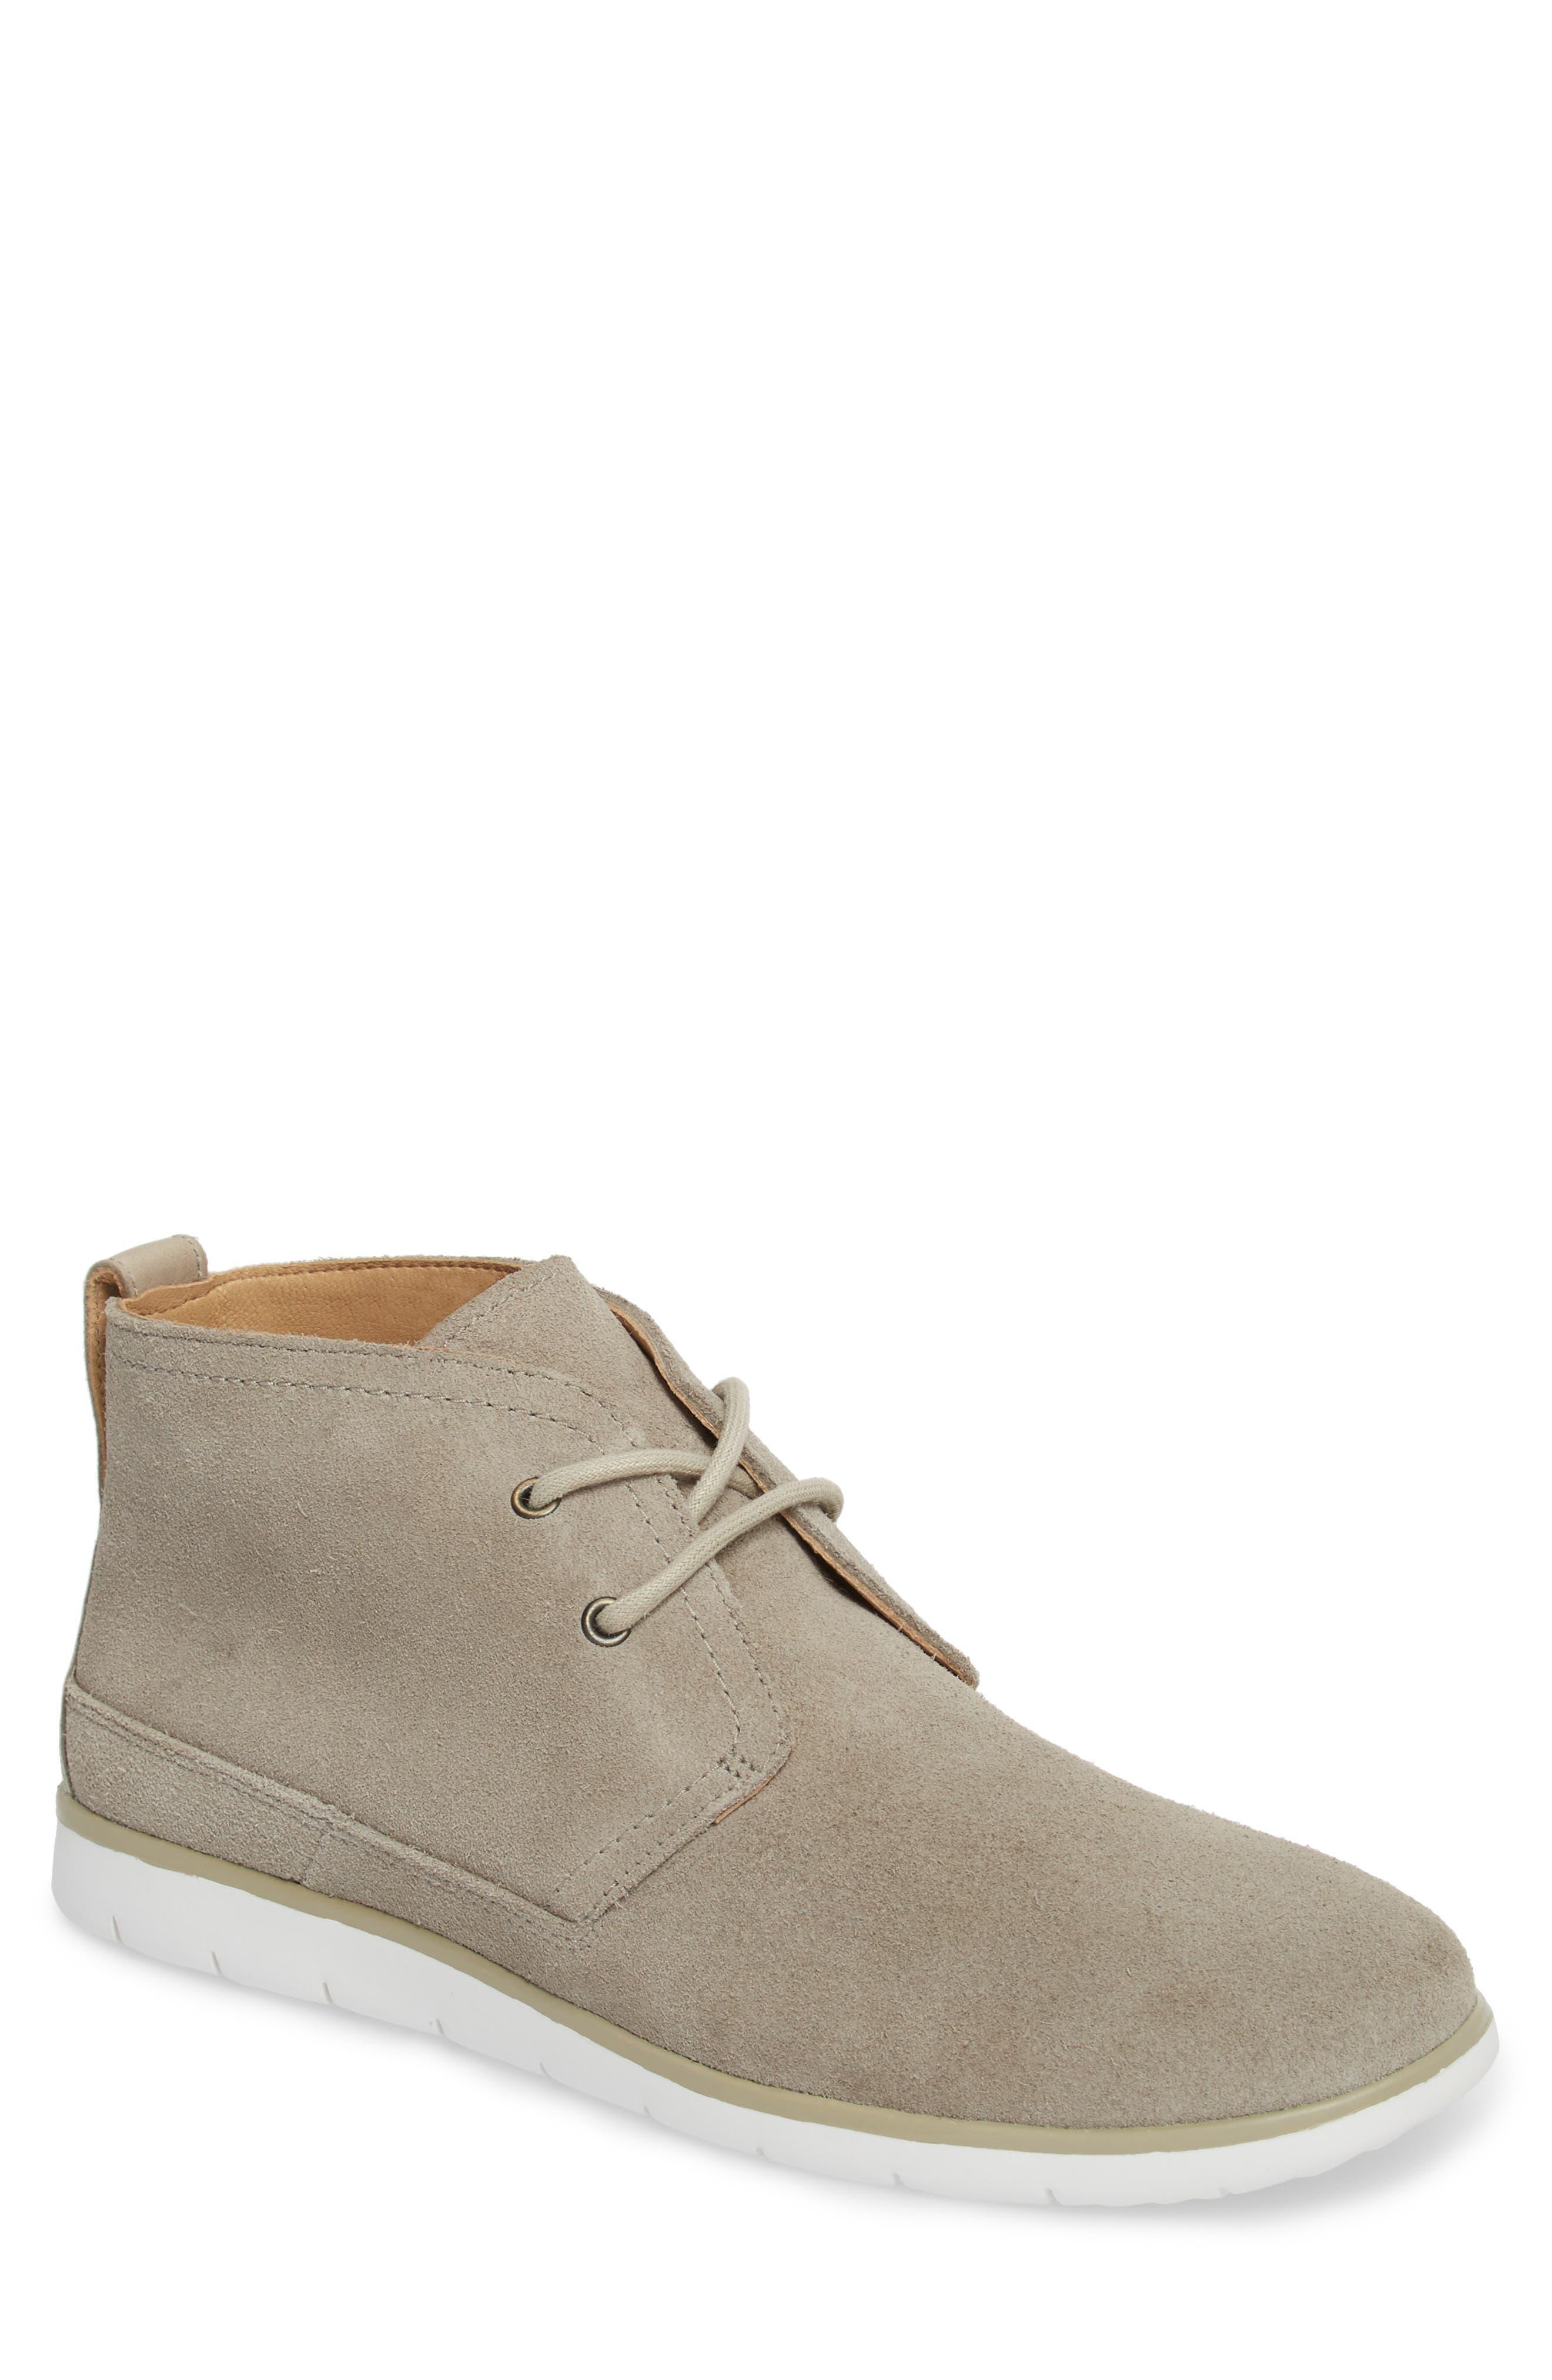 Freamon Chukka Boot,                         Main,                         color, Pumice Leather